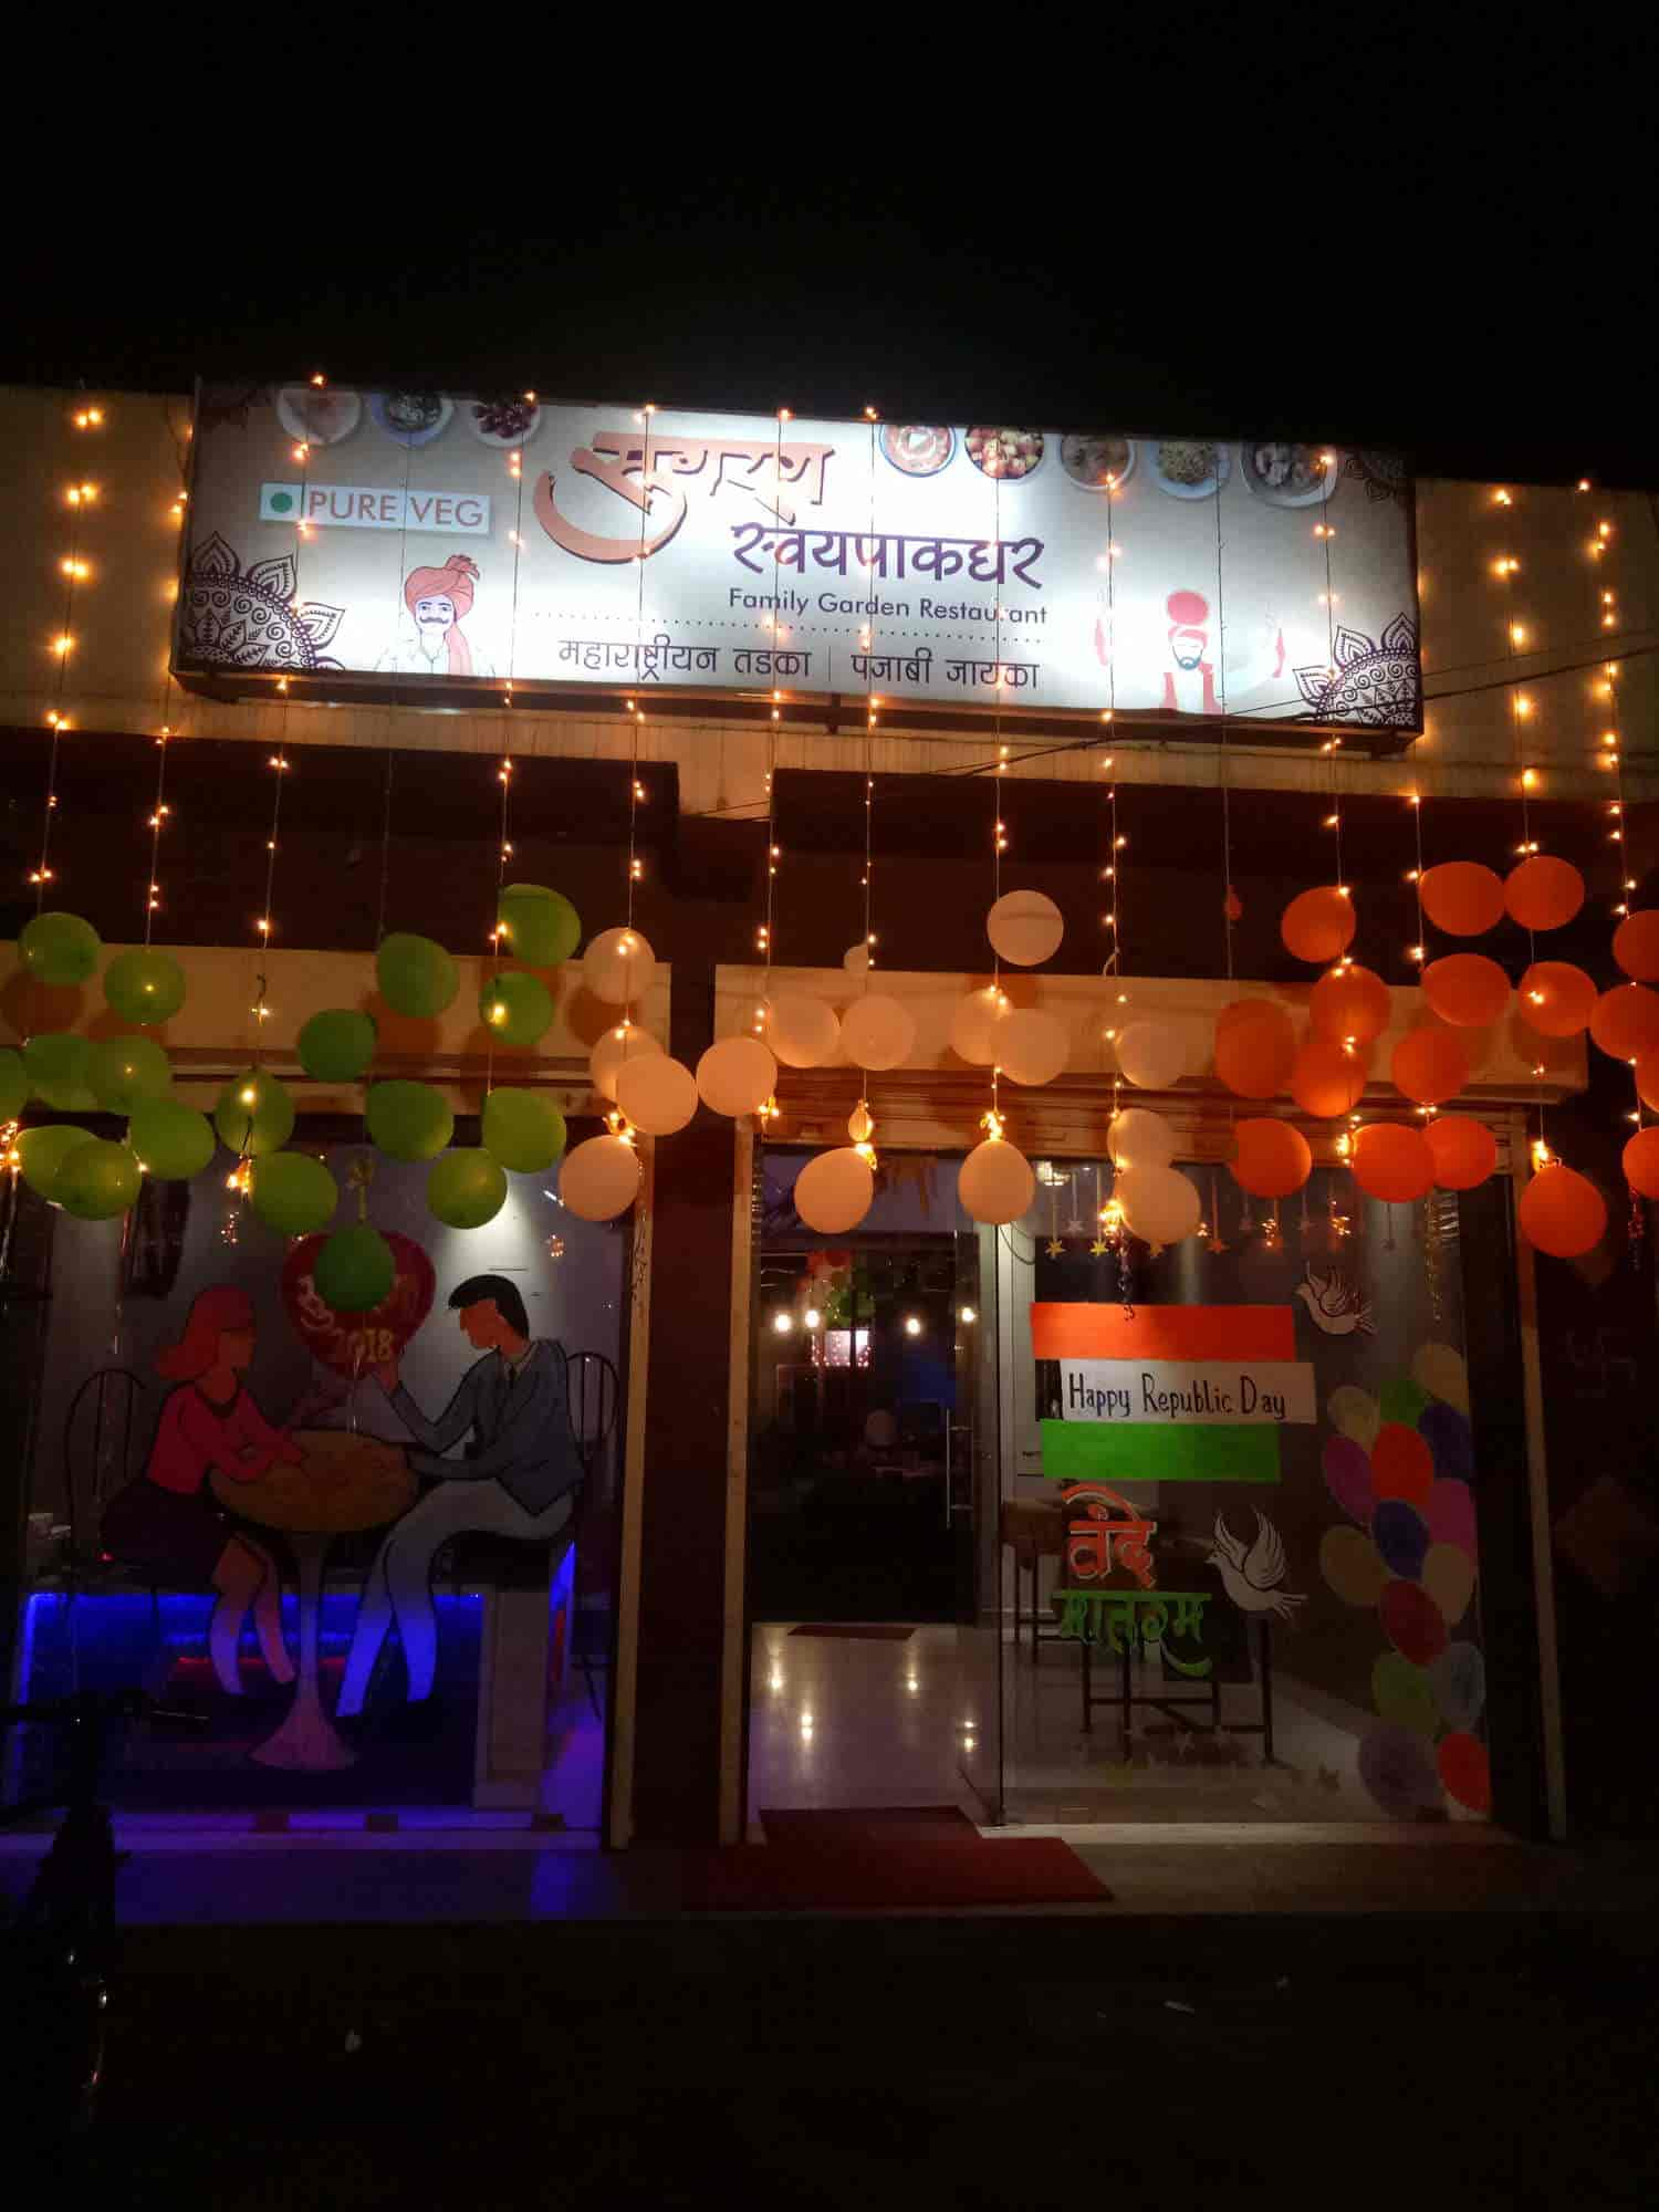 Sugran Swayampakghar Family Garden Restaurant Photos, , Wardha ...